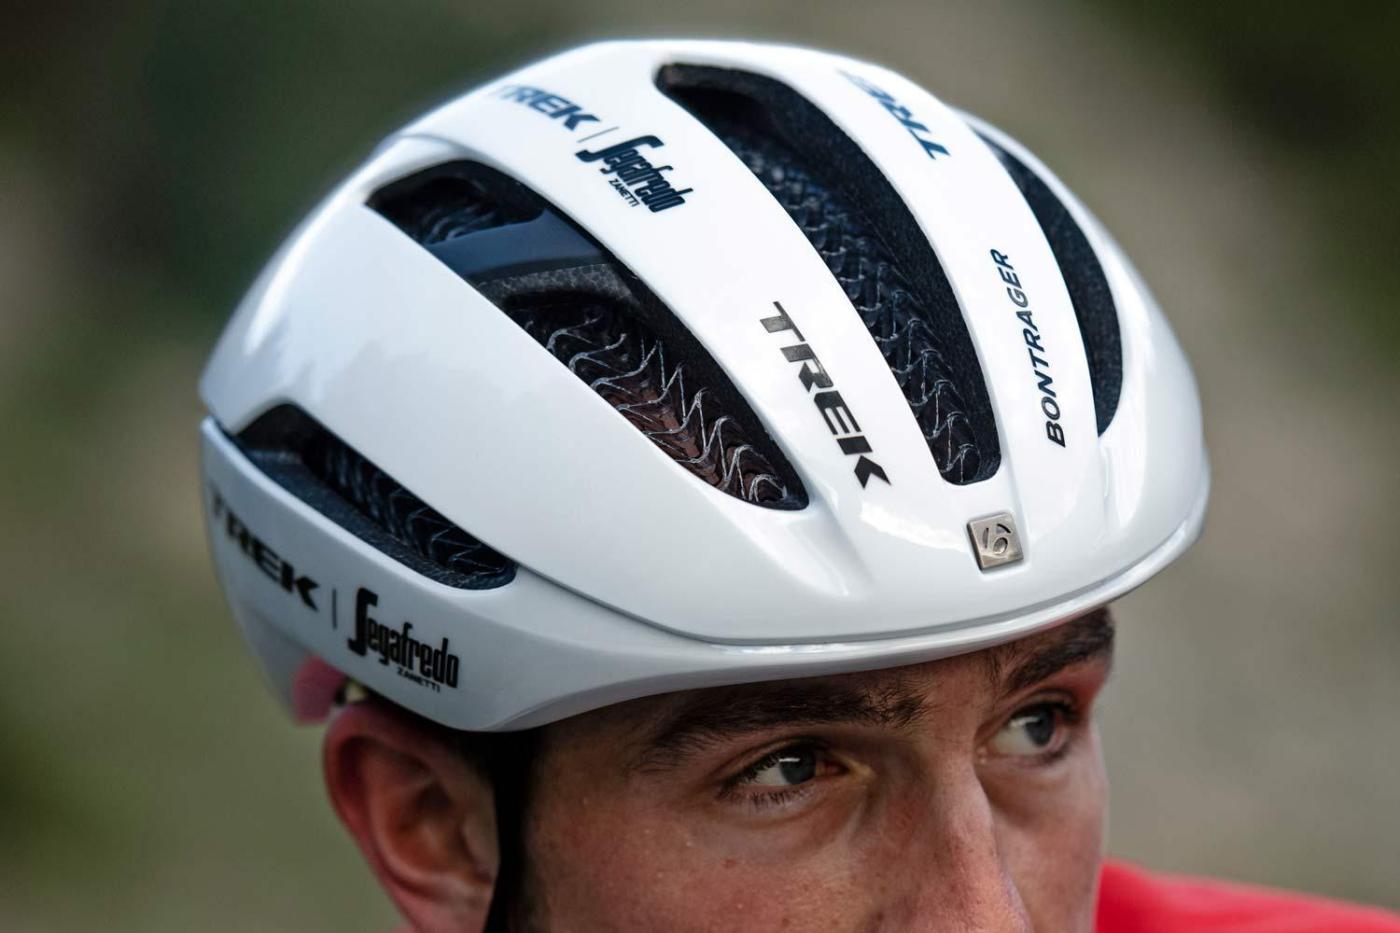 Trek and Bontrager Release New Helmet with WaveCel Technology 3